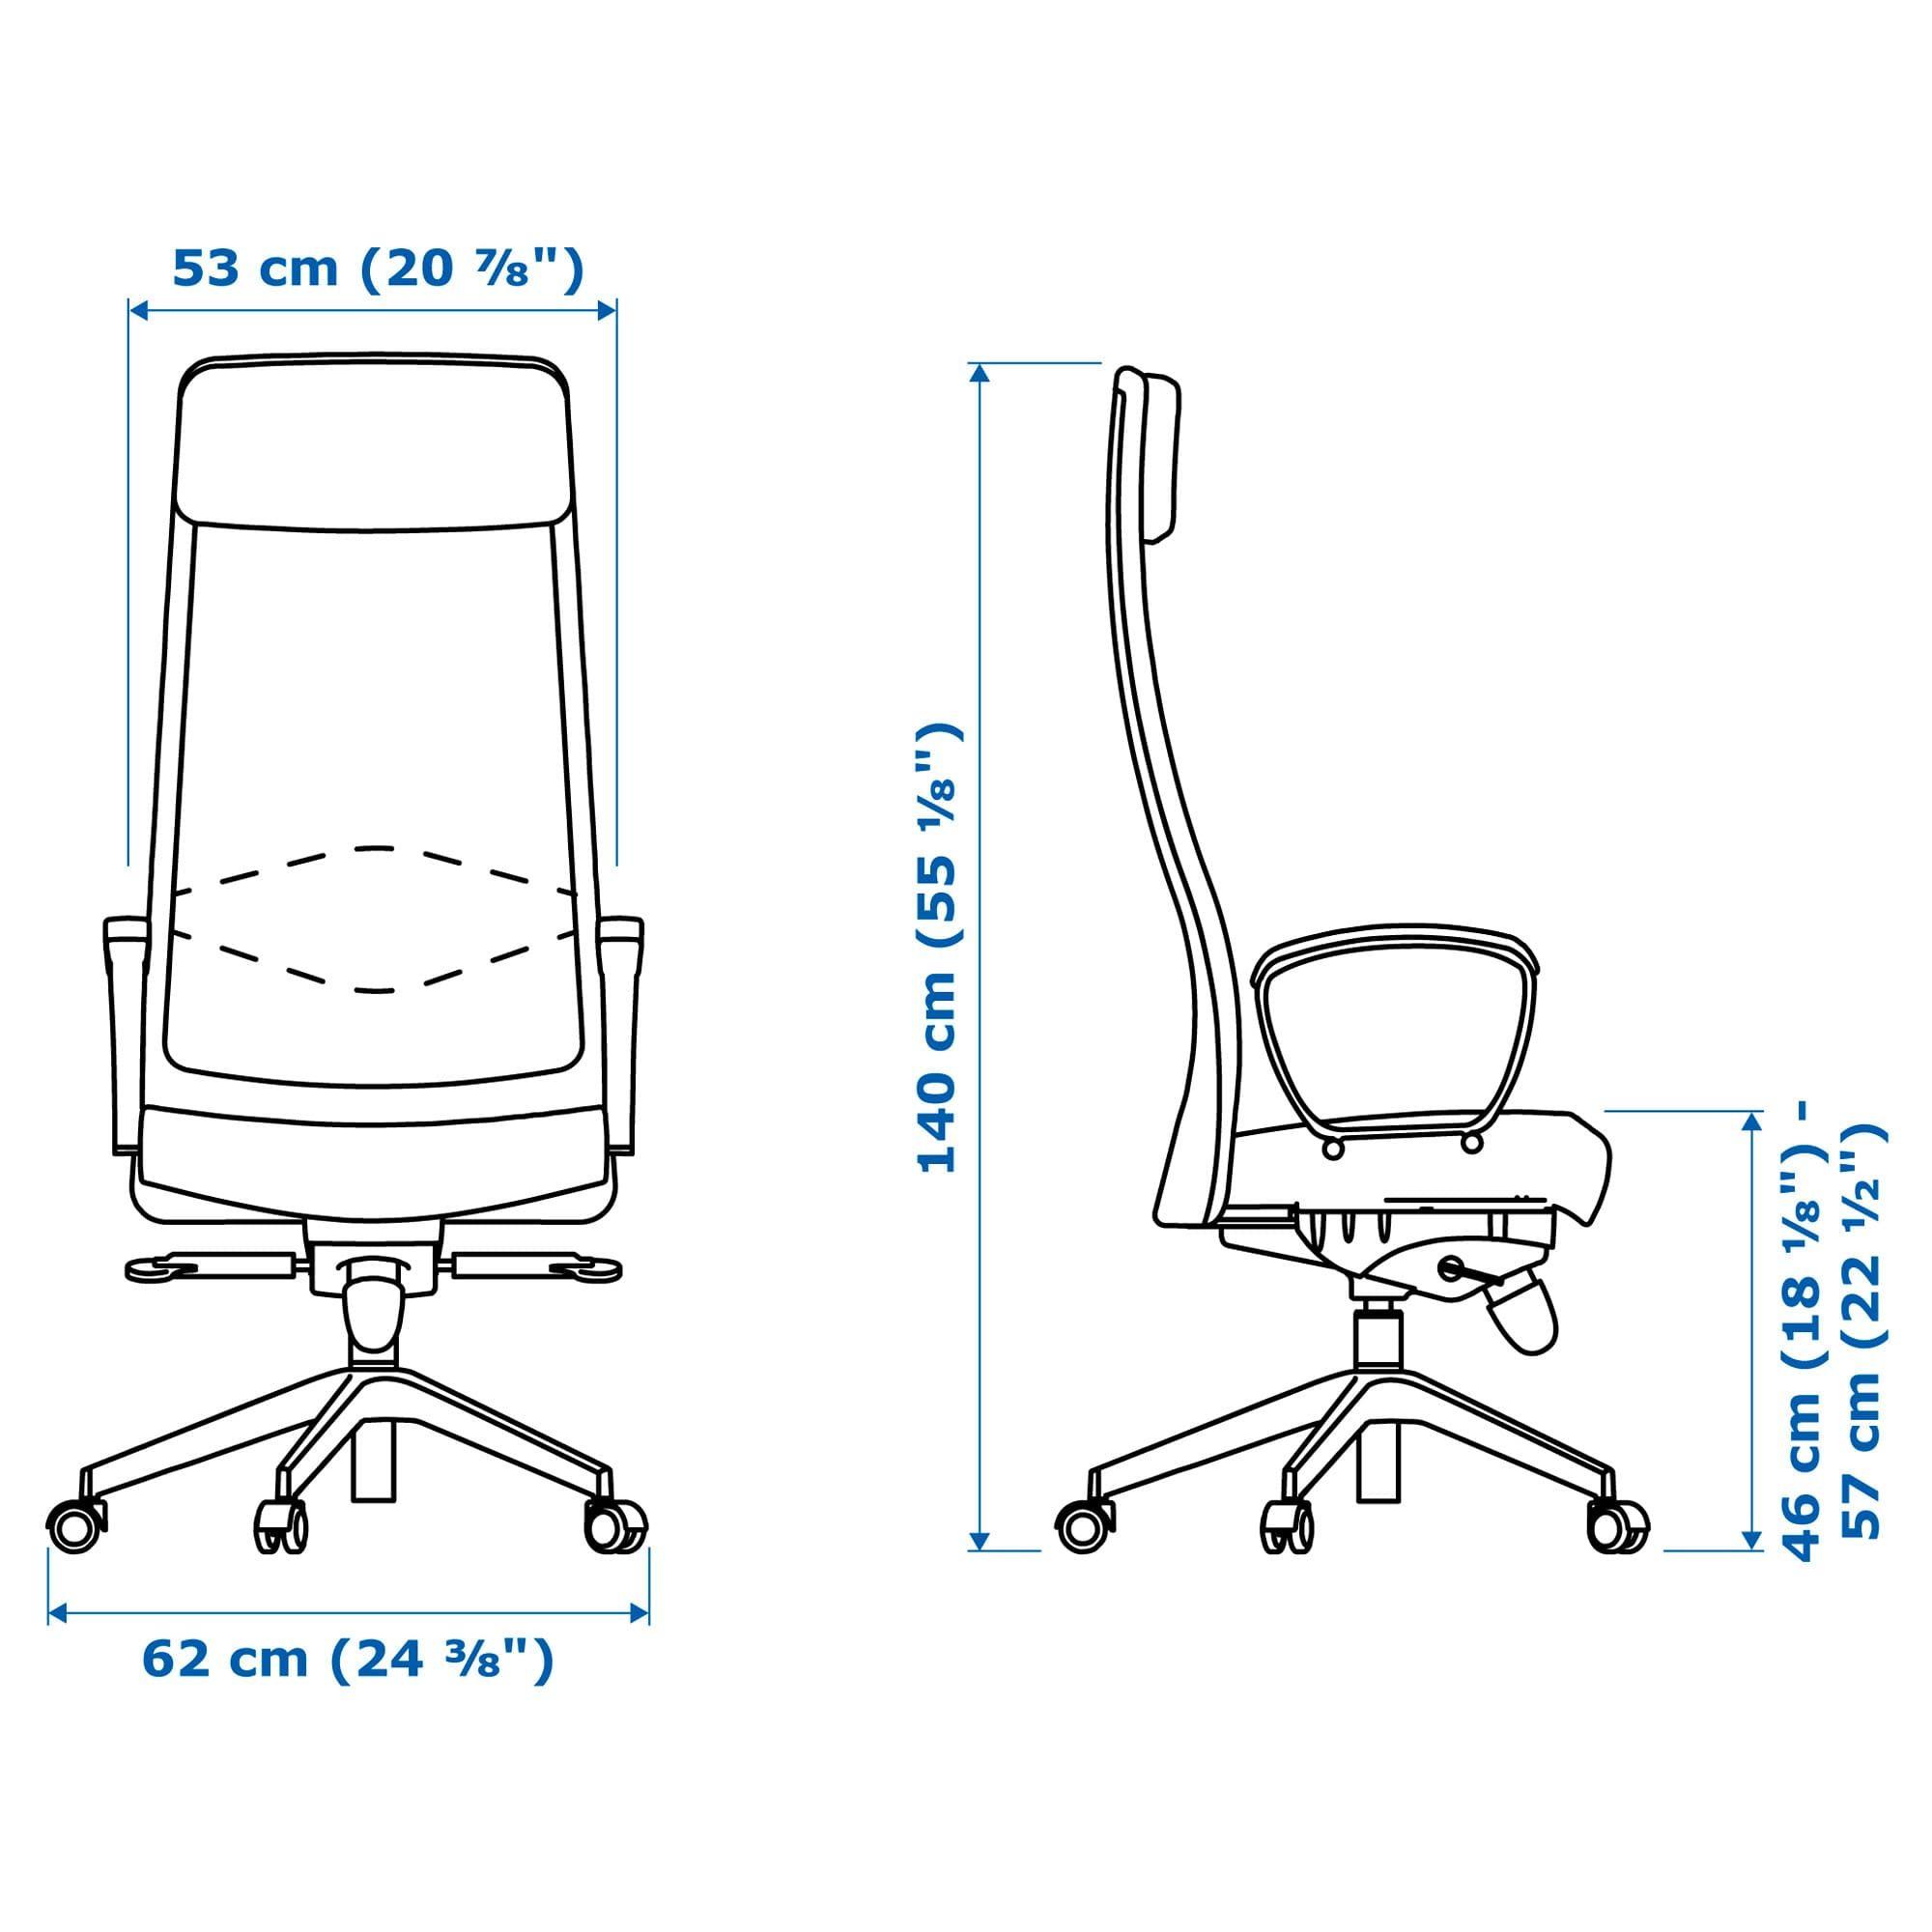 MARKUS Office chair Vissle dark grey | Ikea markus, Black